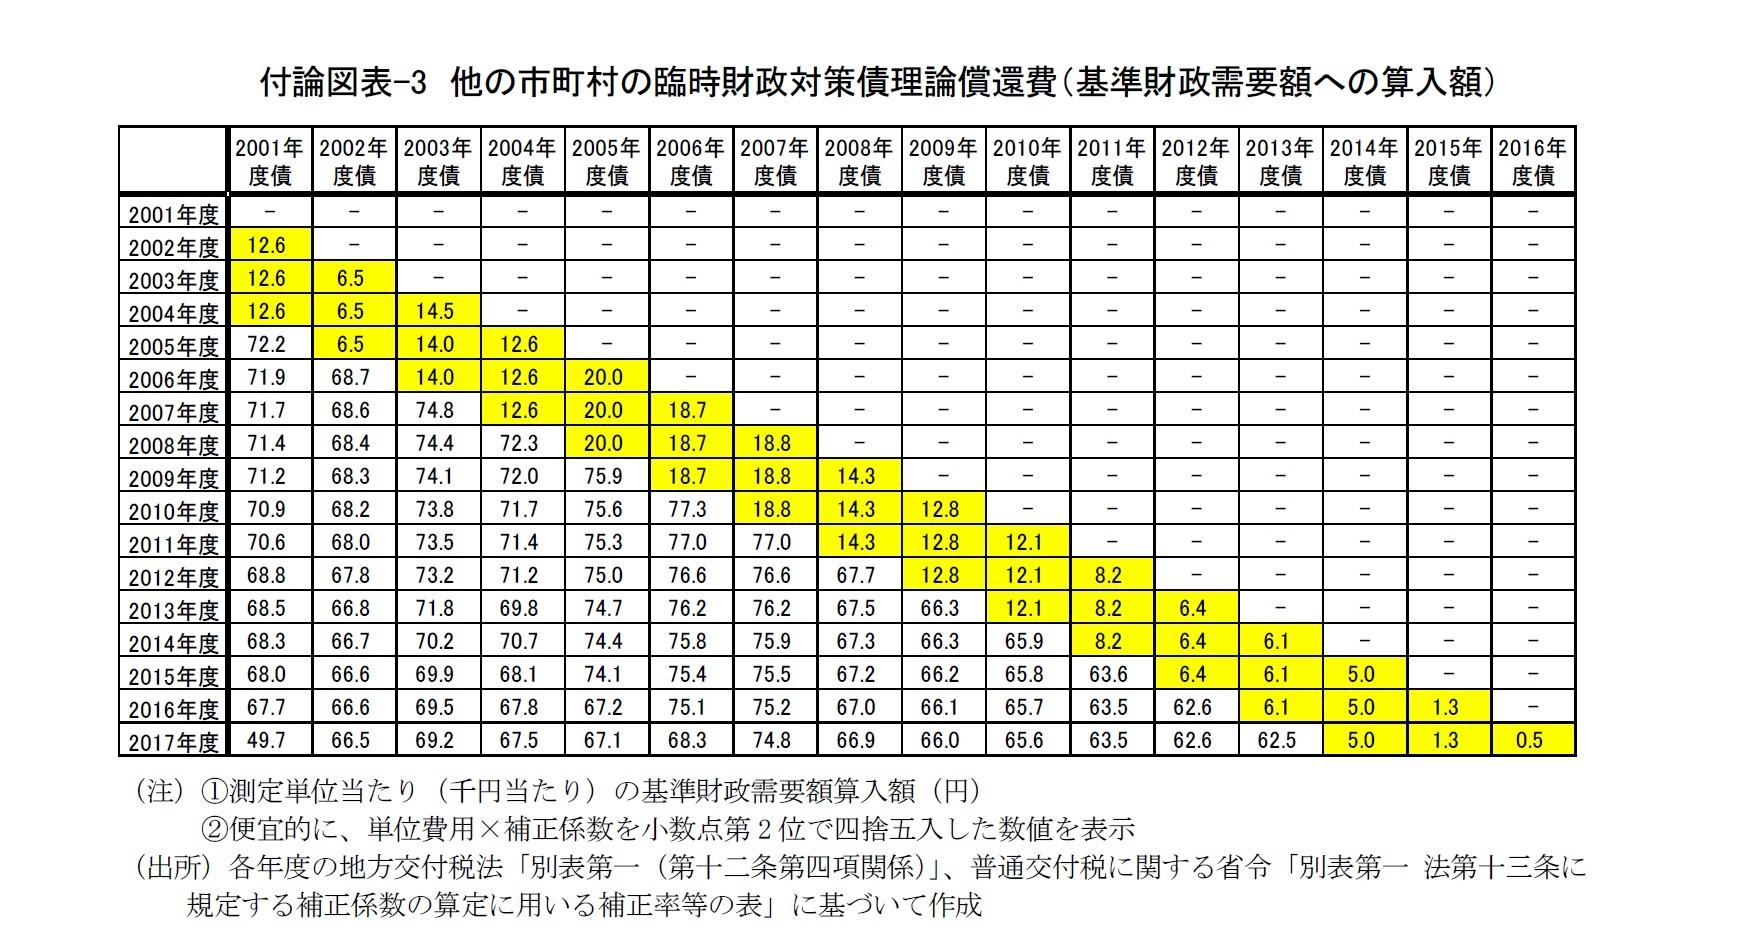 付論図表-3 他の市町村の臨時財政対策債理論償還費(基準財政需要額への算入額)